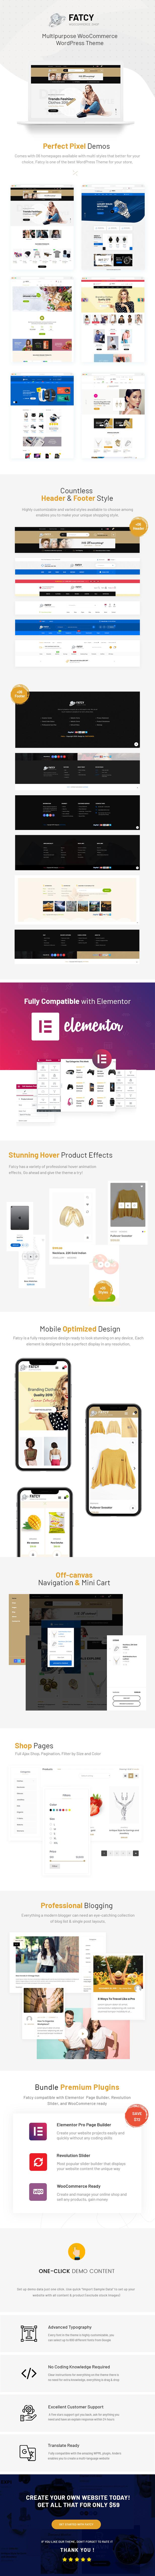 Fatcy - Multipurpose Elementor WooCommerce Theme - 1